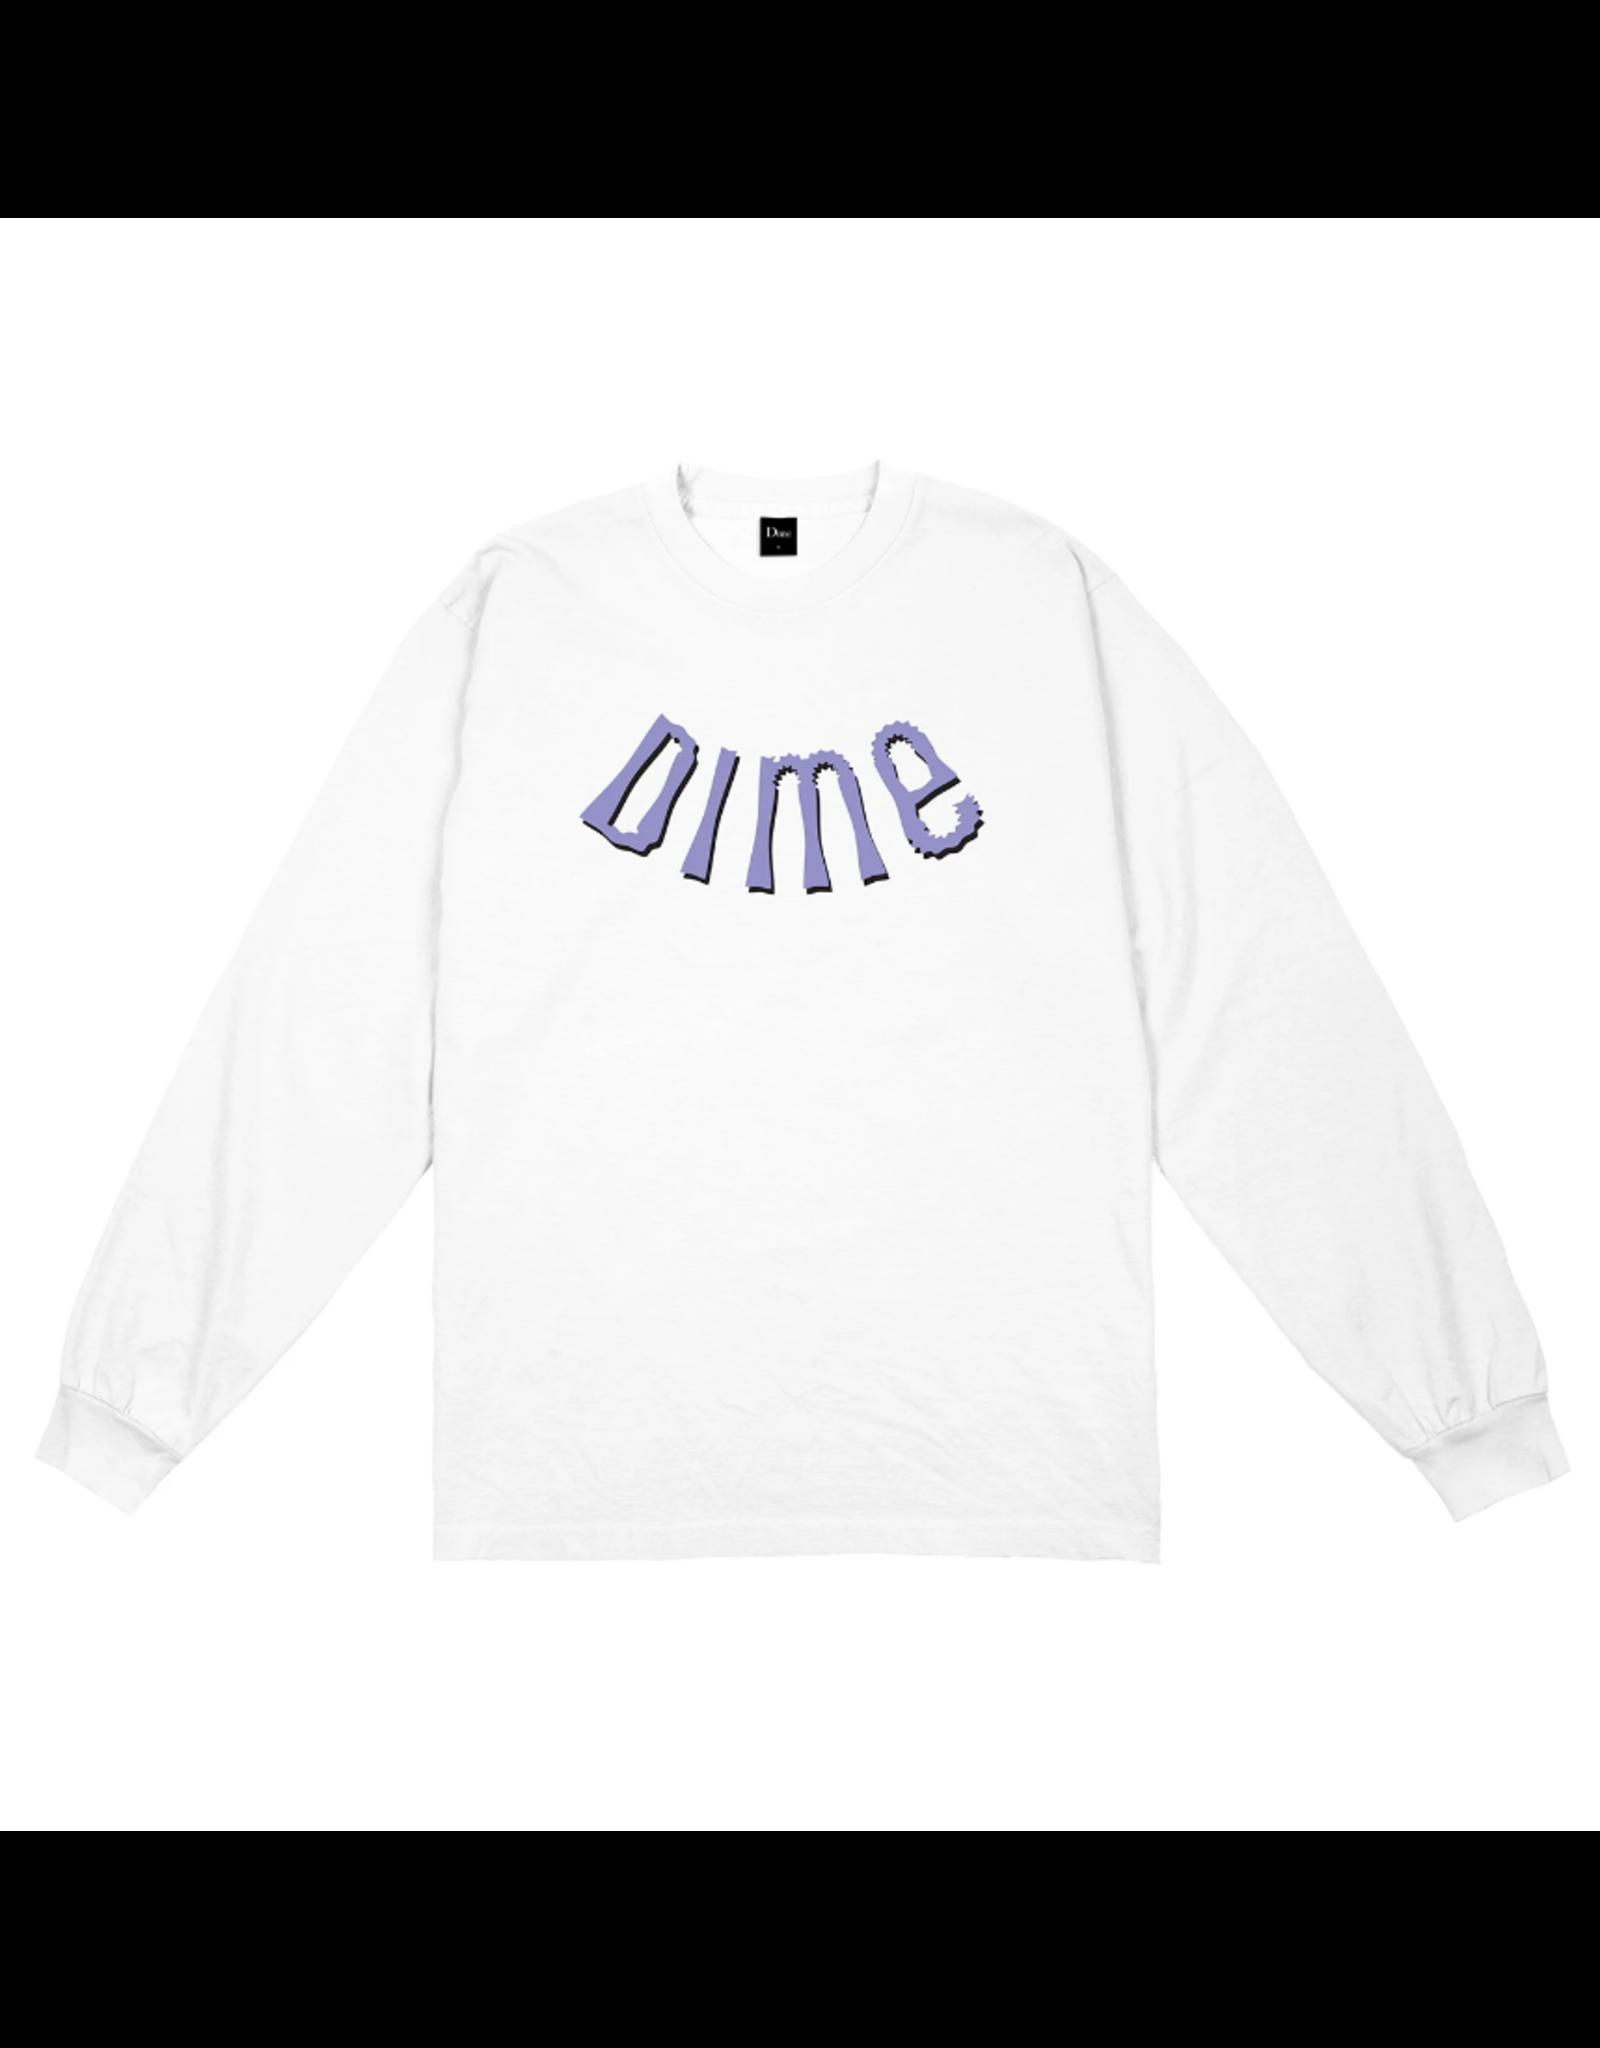 Dime Whirl L/S Shirt - White